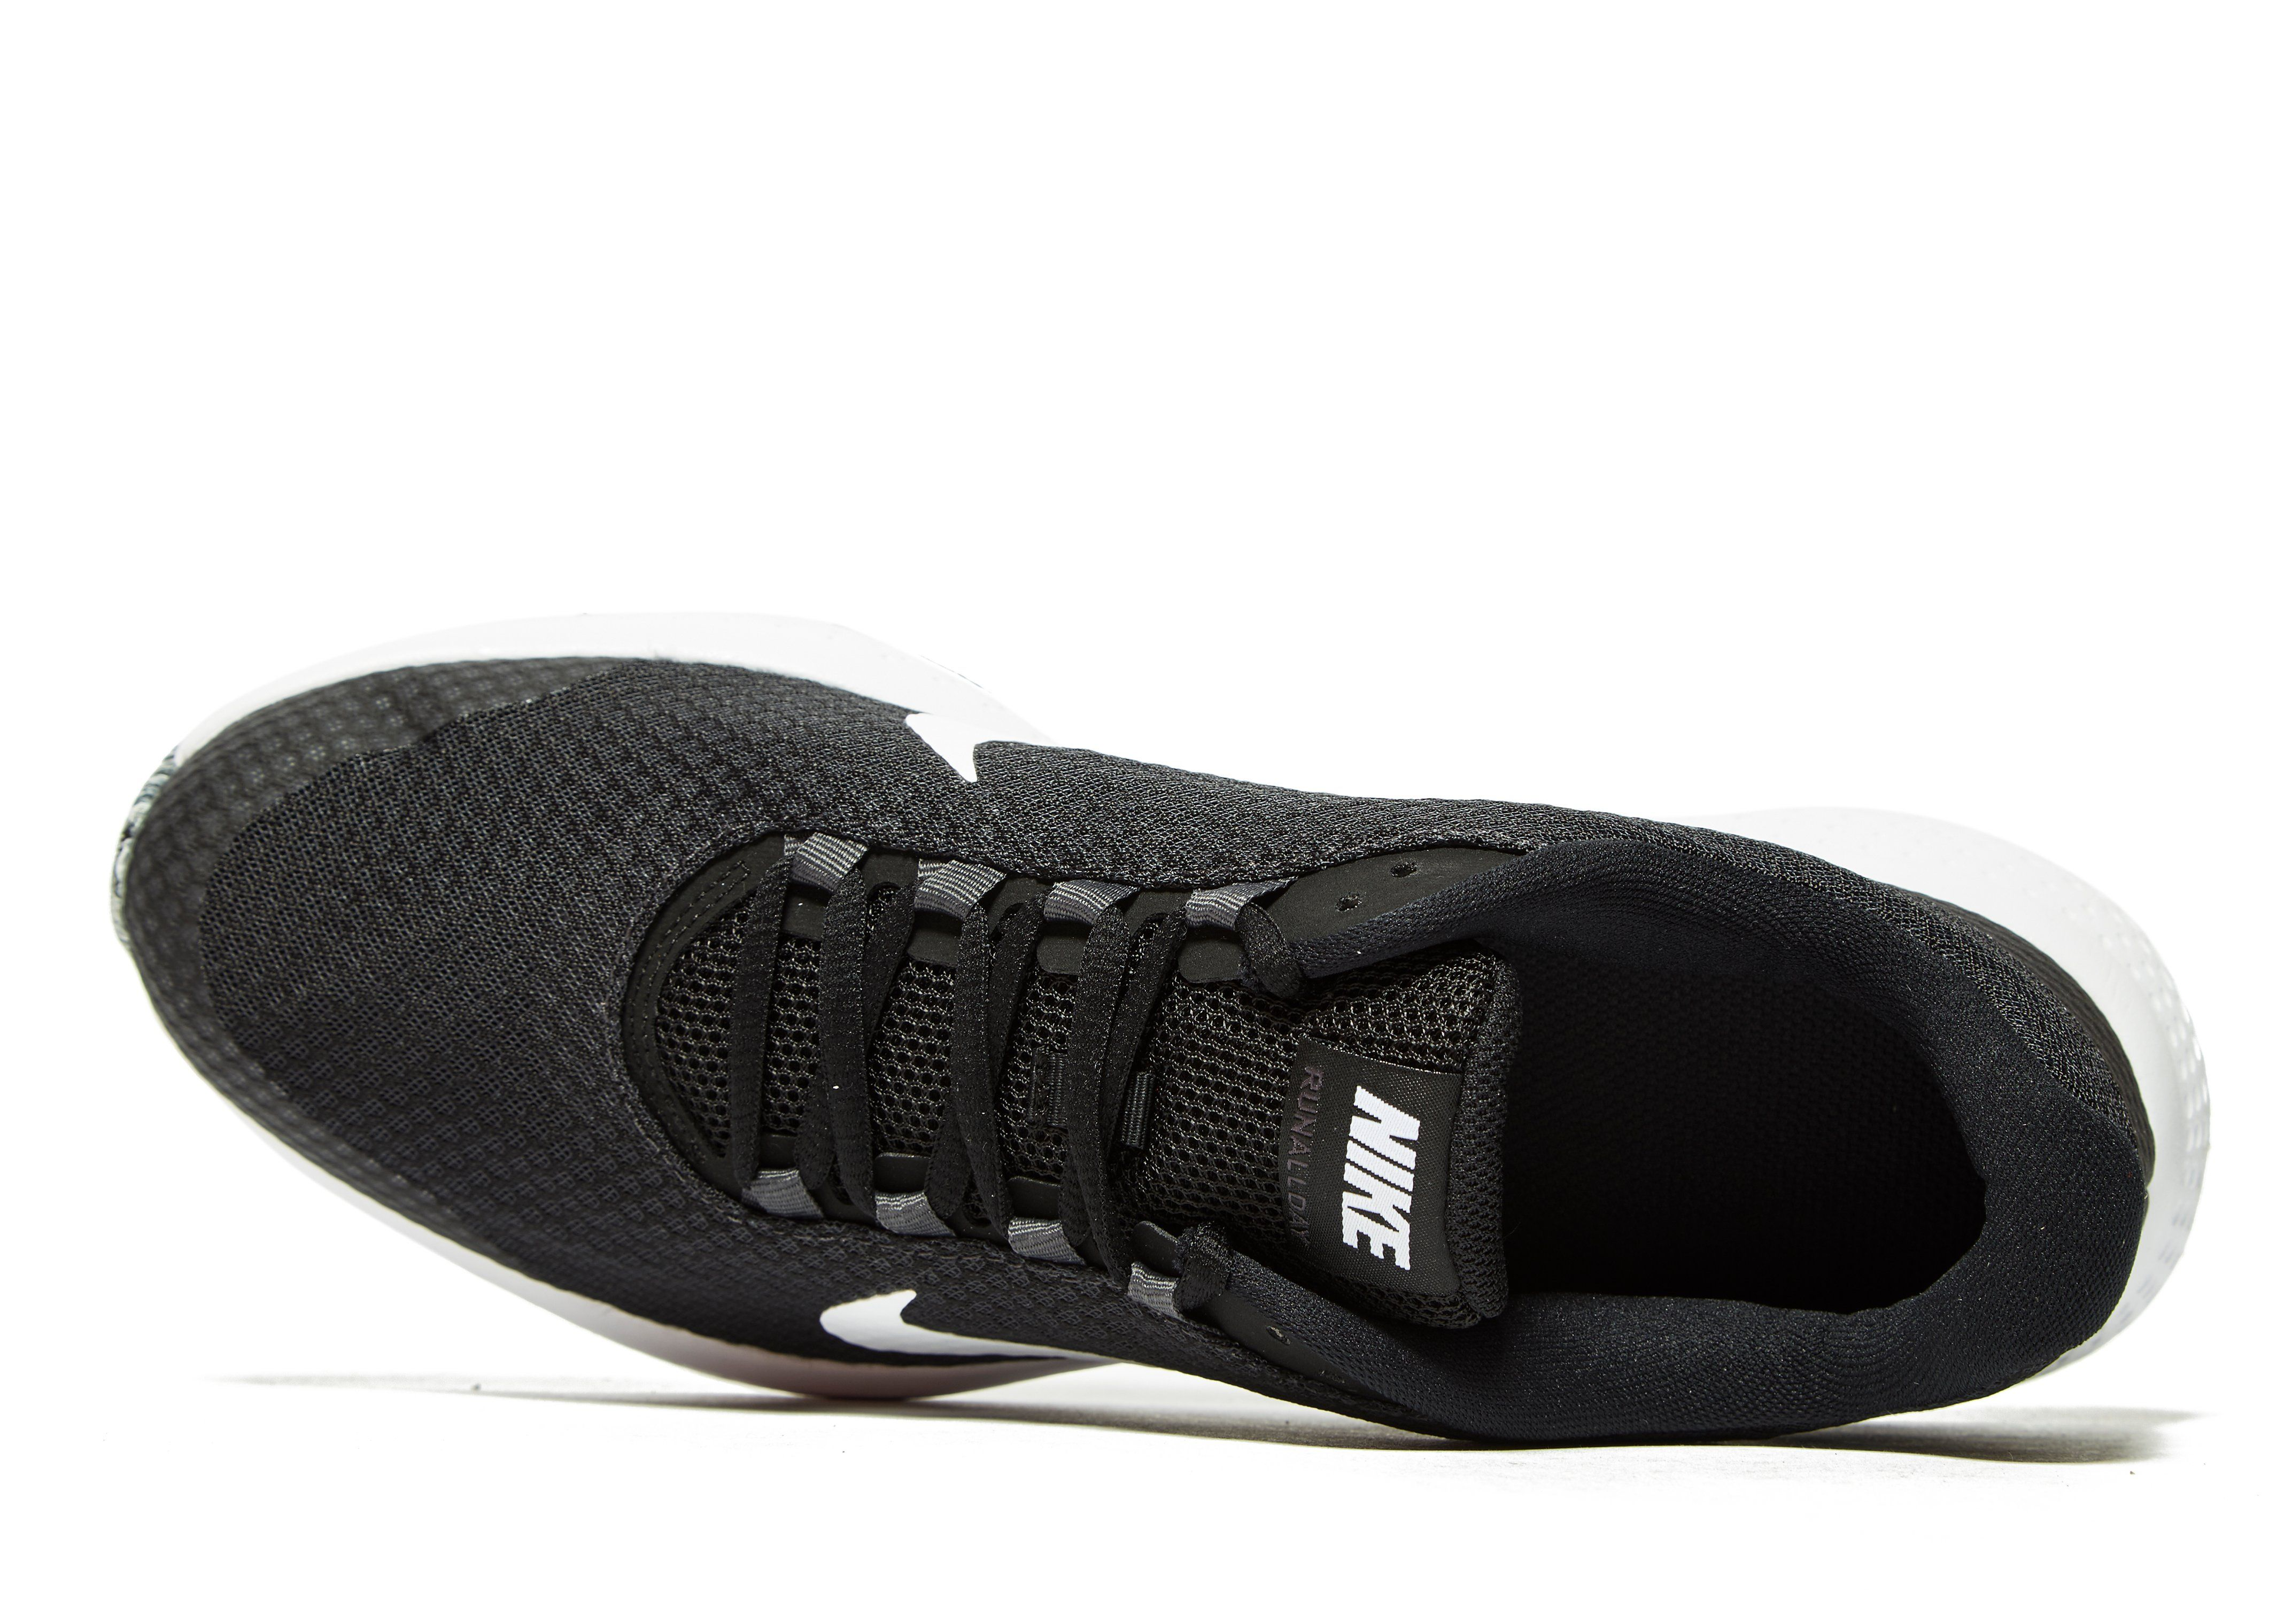 Nike Run All Day 2 Schwarz Original Niedriger Preis bJkzebZdkh